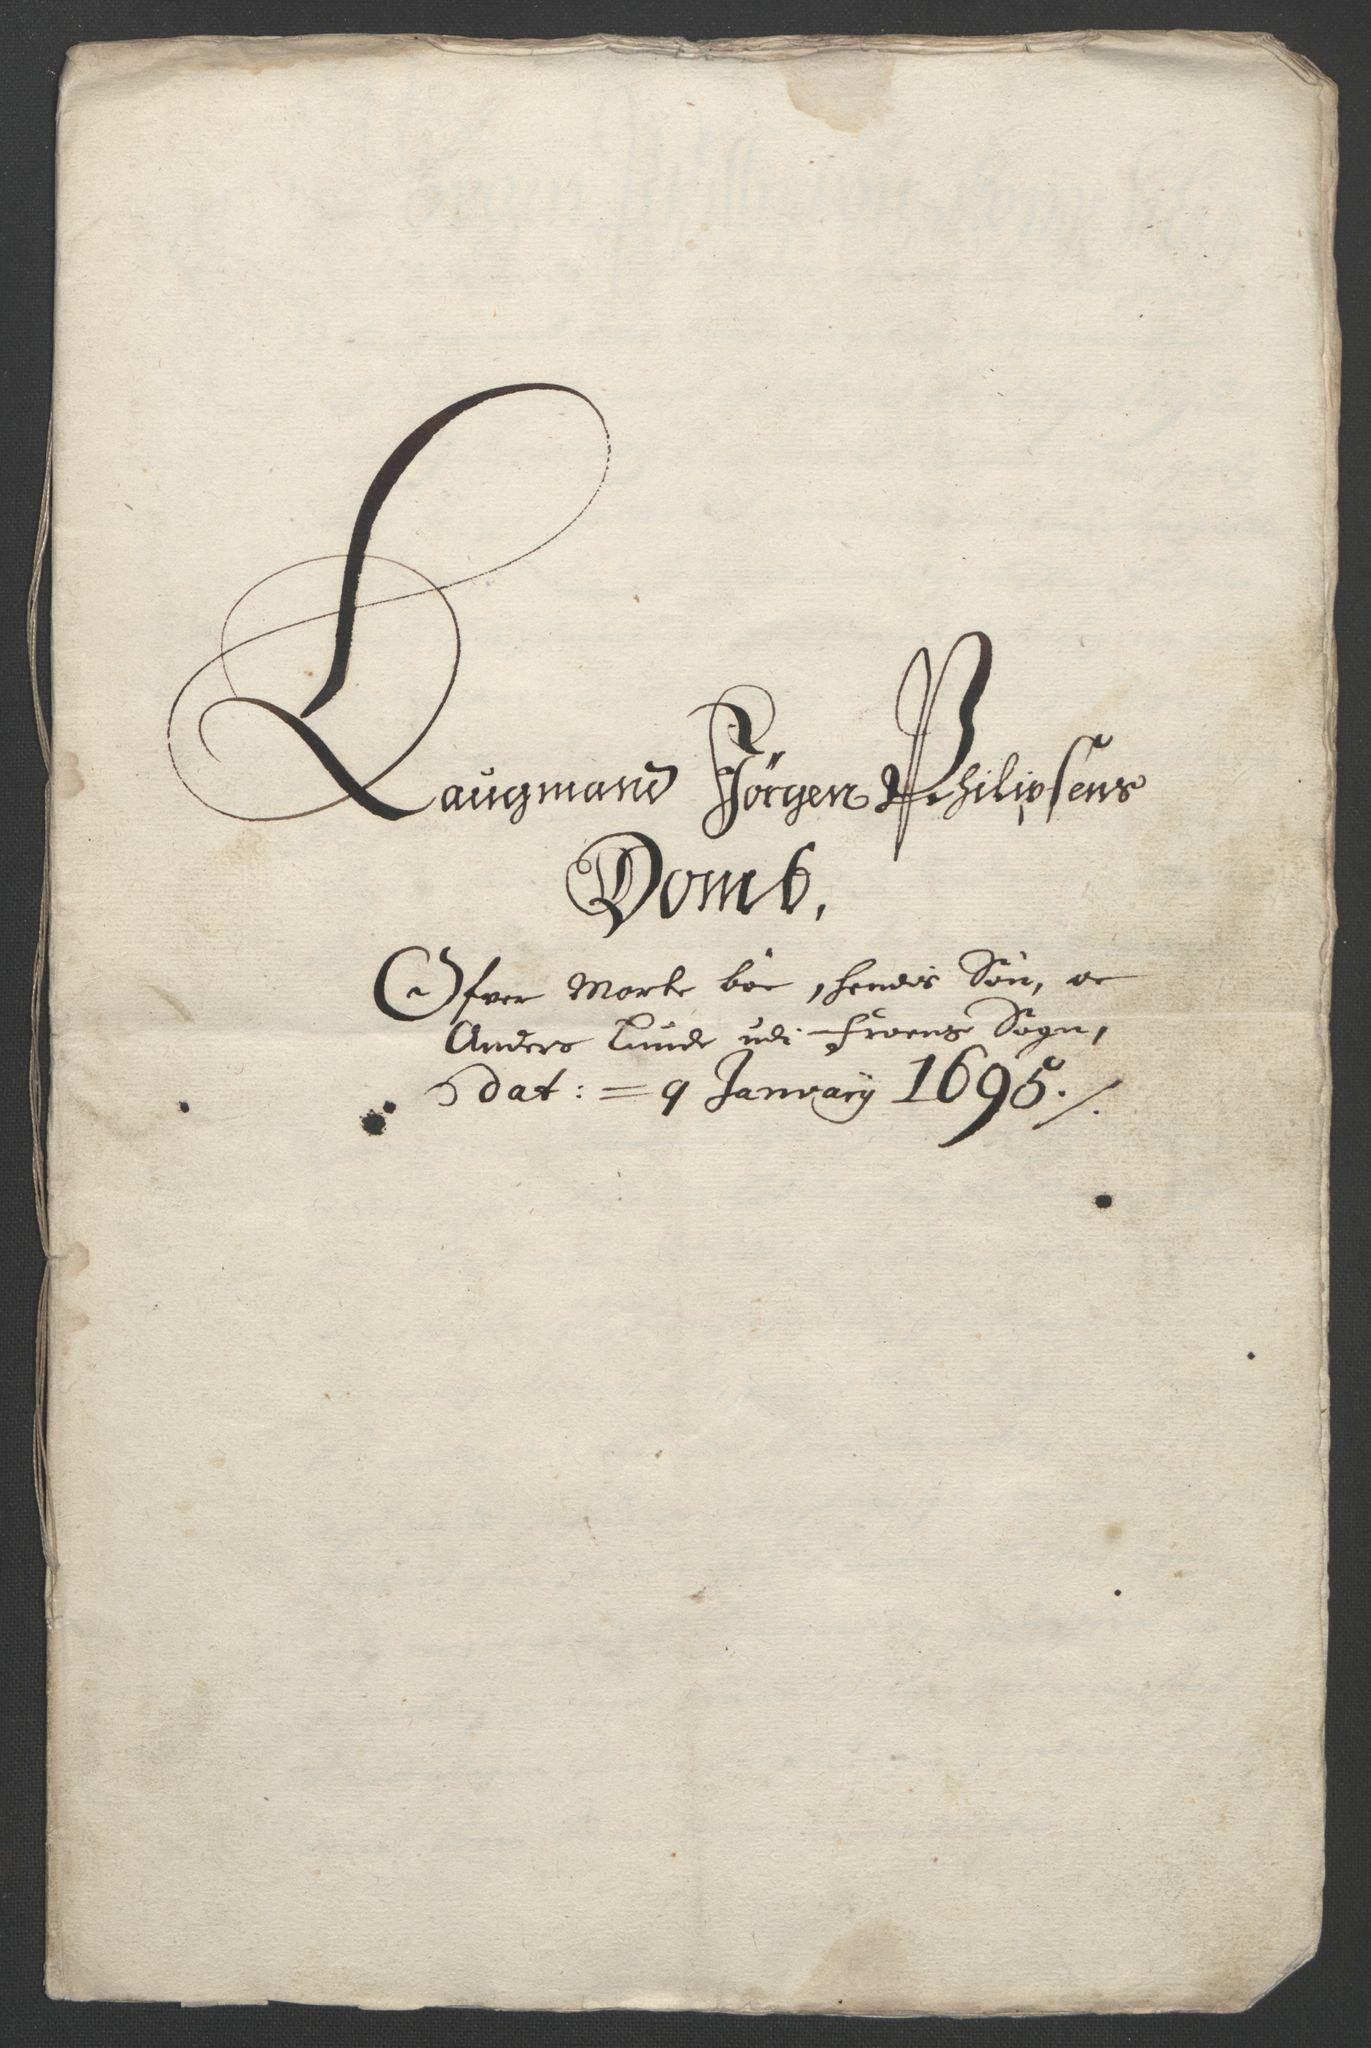 RA, Rentekammeret inntil 1814, Reviderte regnskaper, Fogderegnskap, R17/L1169: Fogderegnskap Gudbrandsdal, 1695, s. 166